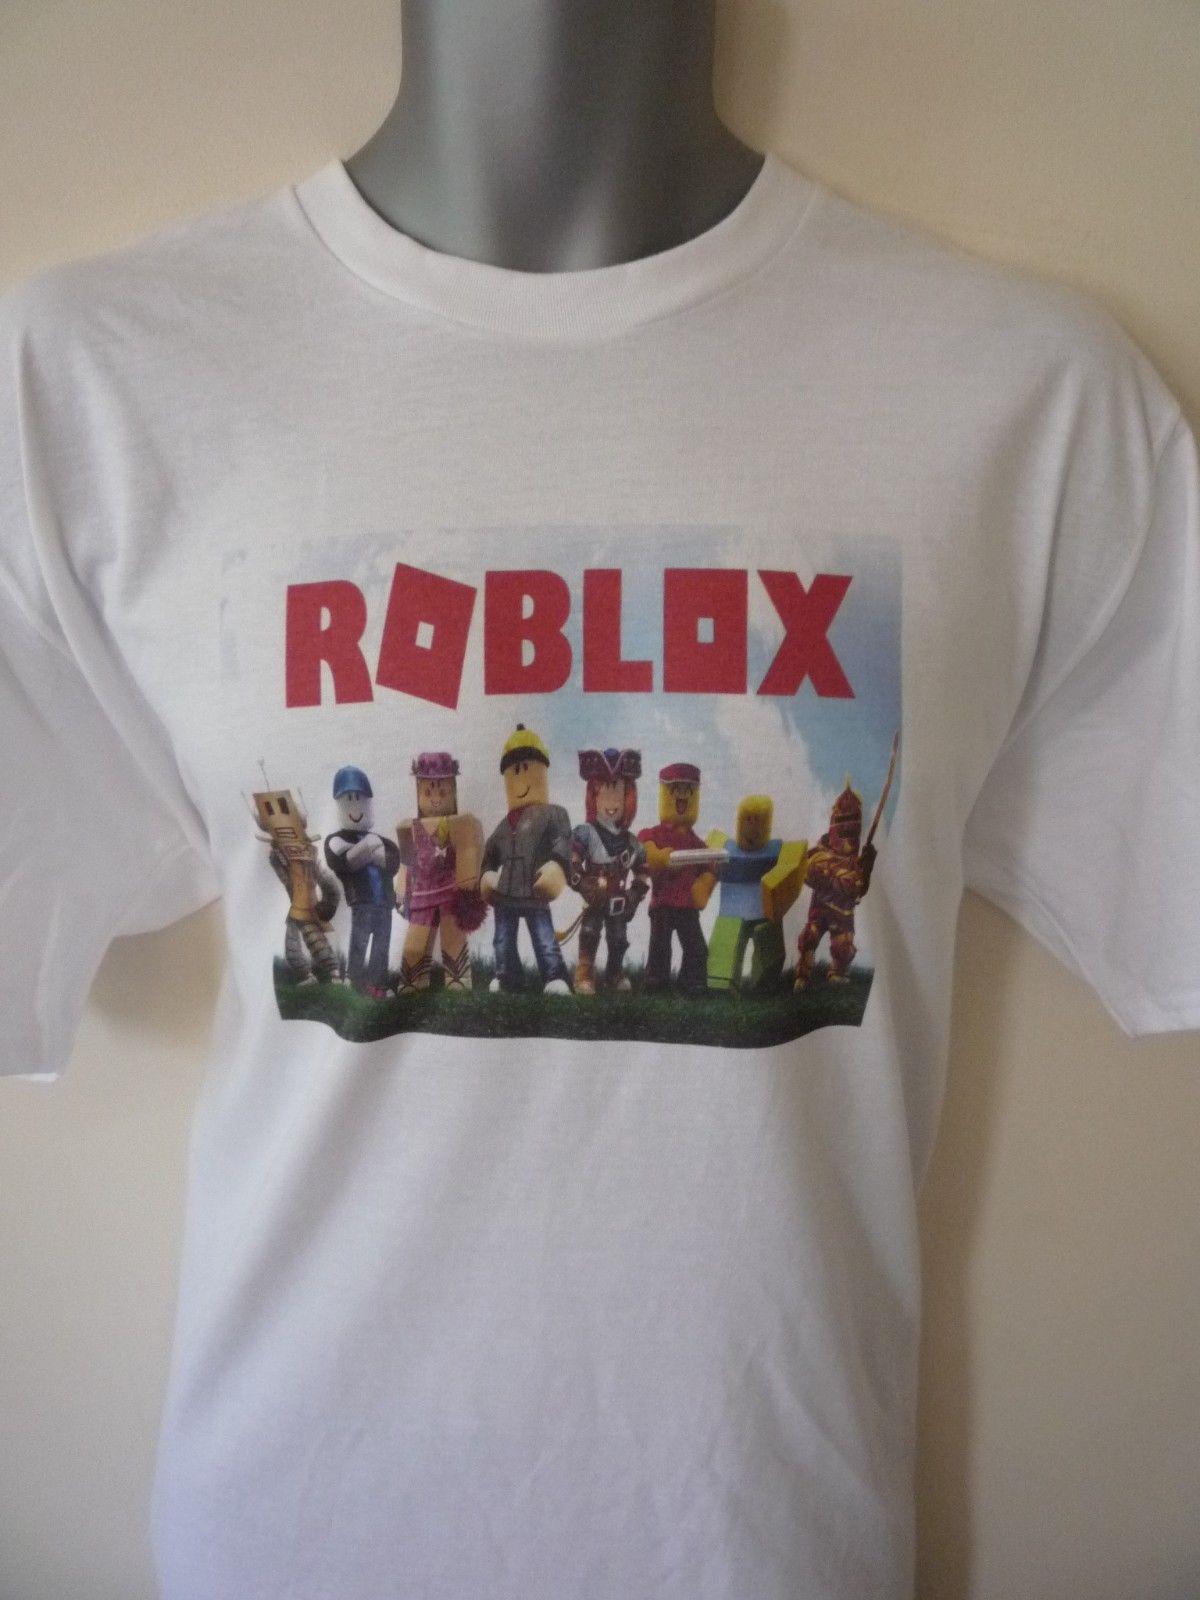 Roblox Character Design T Shirt Gaming Gamer Xbox Boys Girls Adult